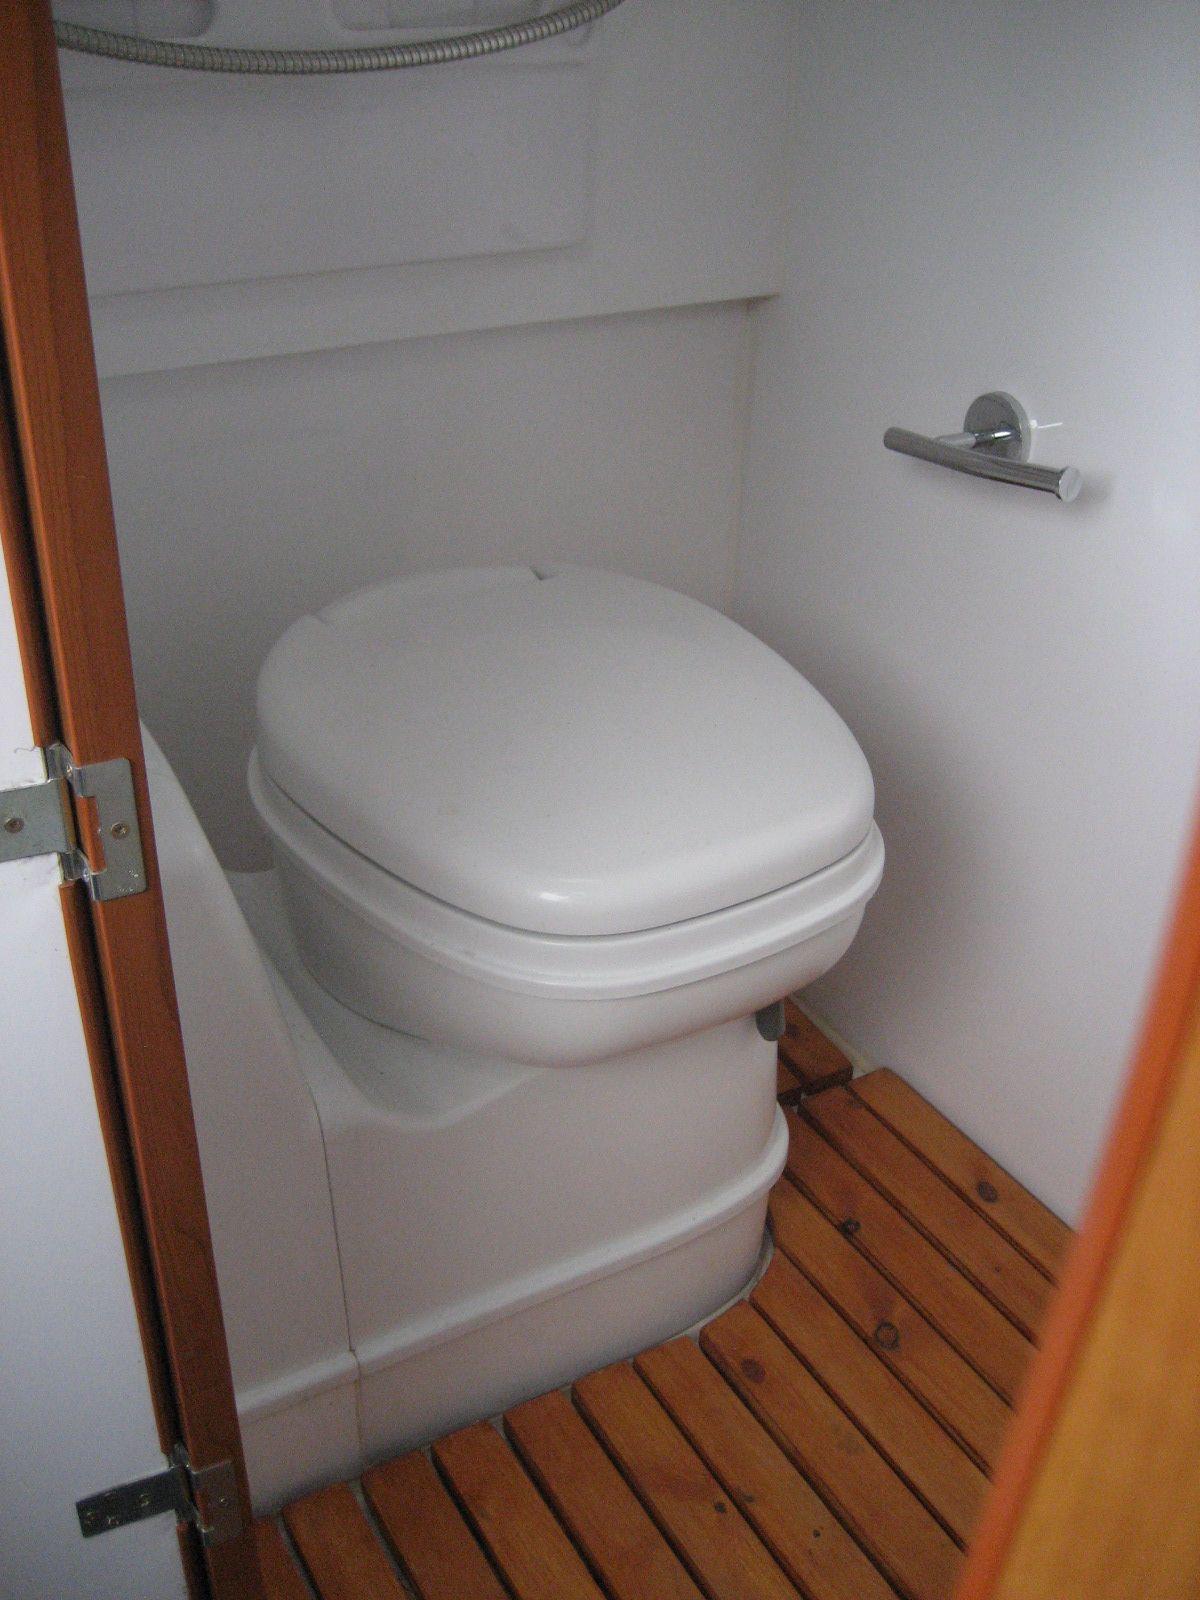 Campervan Toilet Guide Camper Bathroom Pinterest Truck Camper Van Life And Rv